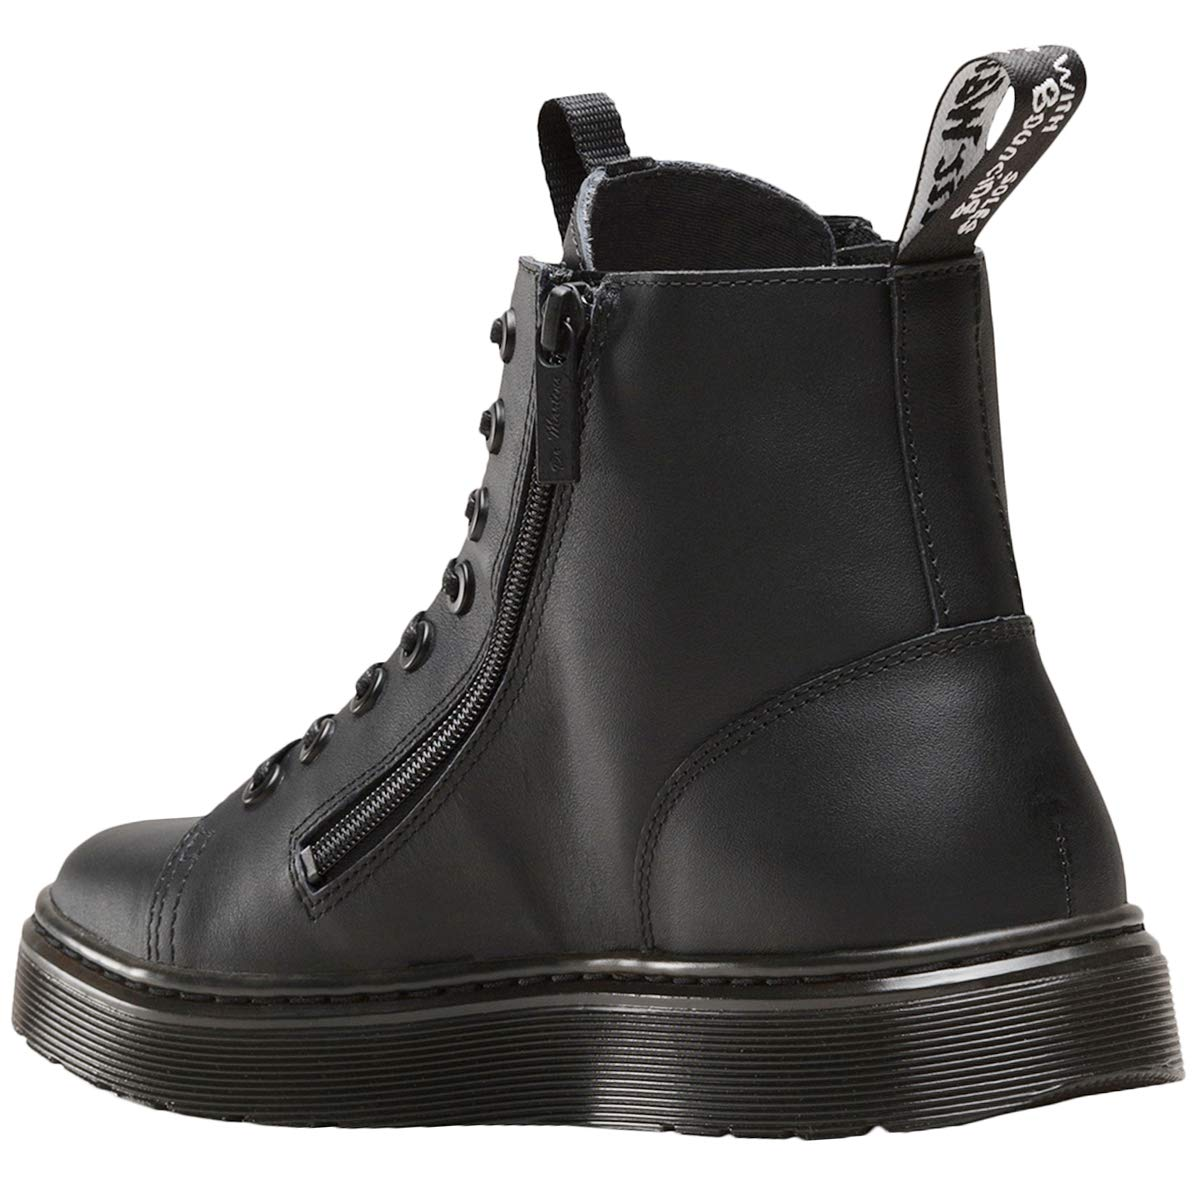 Dr. Martens Unisex Schuhe Boot Talib Zip Schnürstiefel Boots Combat Boot Schuhe Black fd35f0